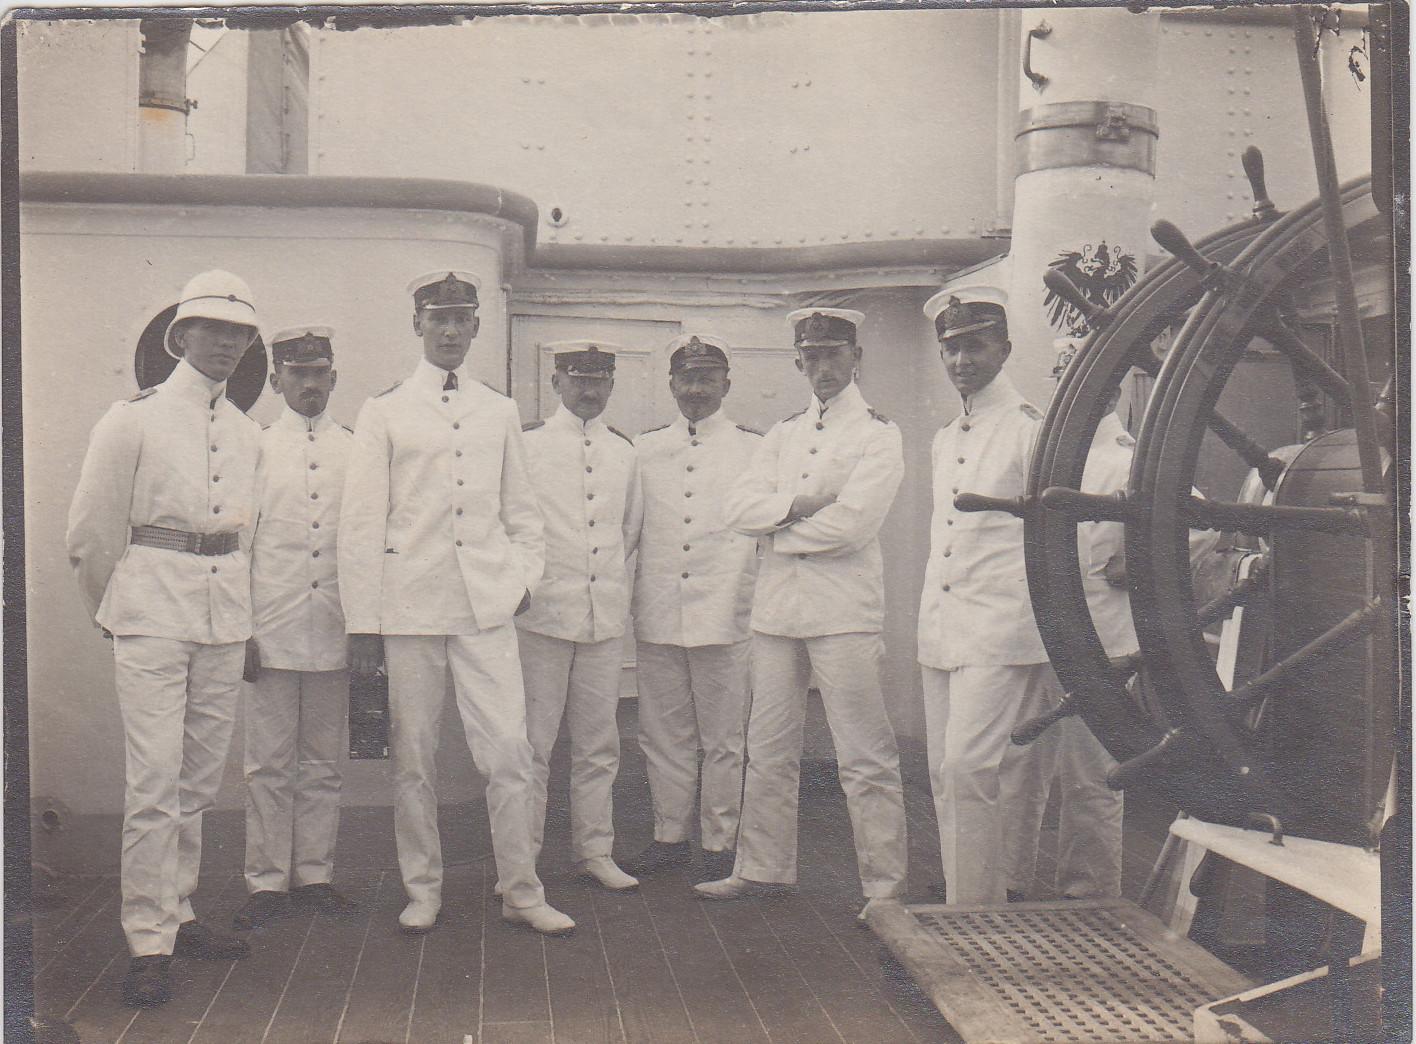 Offizierkorps von links nach rechts: Oberleutnant Ney, Kptl. Nittke (1. Offizier), Ltn. Gärtner, Stabsarzt Dr. Medow, Ob-Ing. Wolf, Obl. Kuno, Obl. Rave, Ob-Zahlm. Braukopf